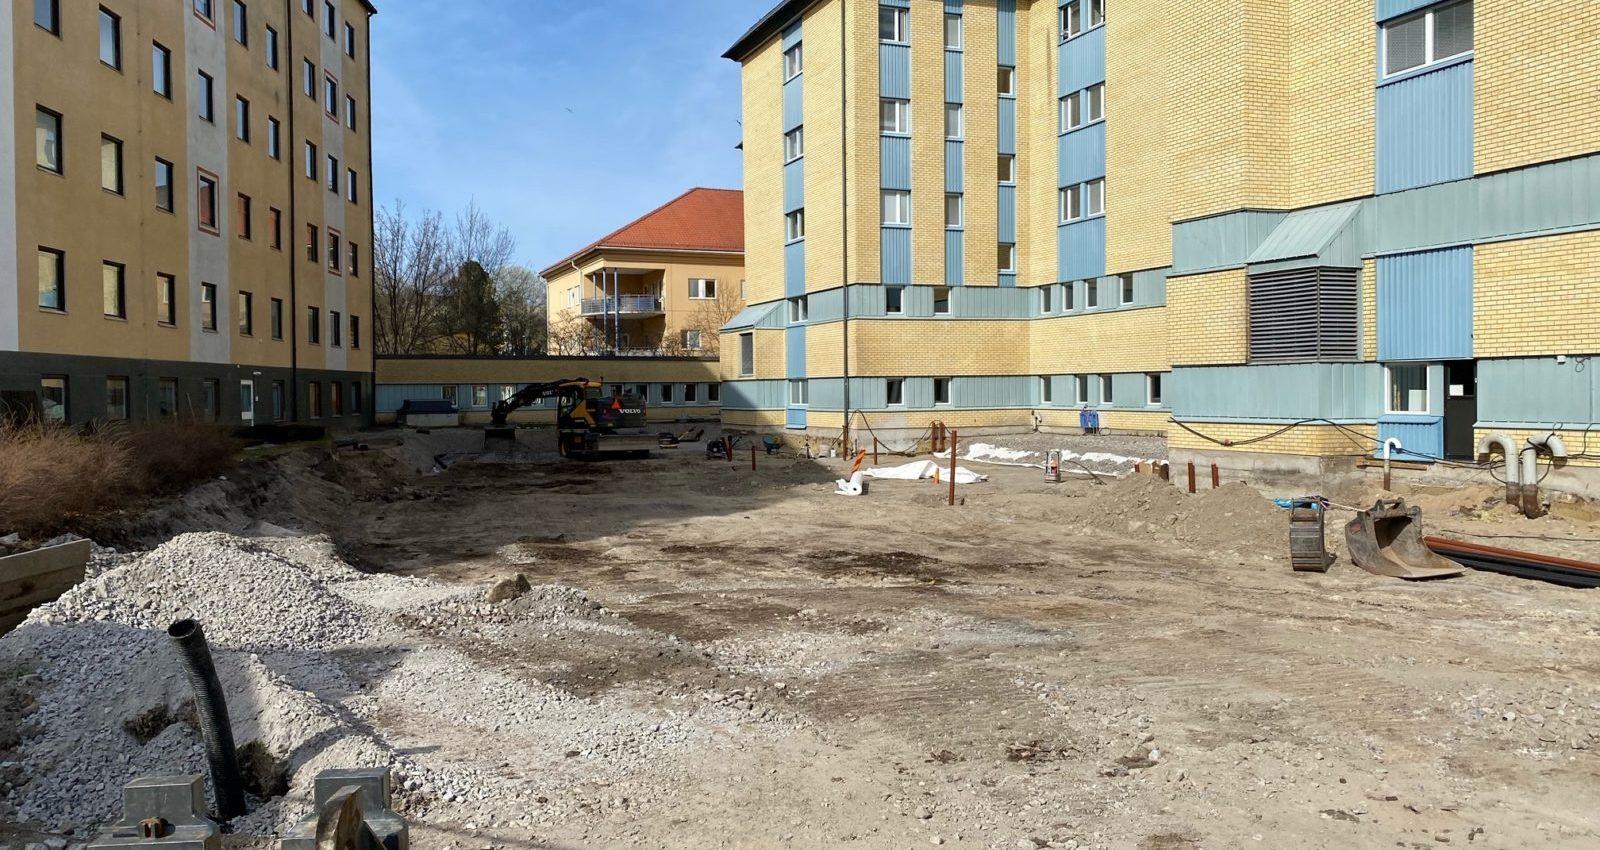 Bygge hudiksvall sjukhus